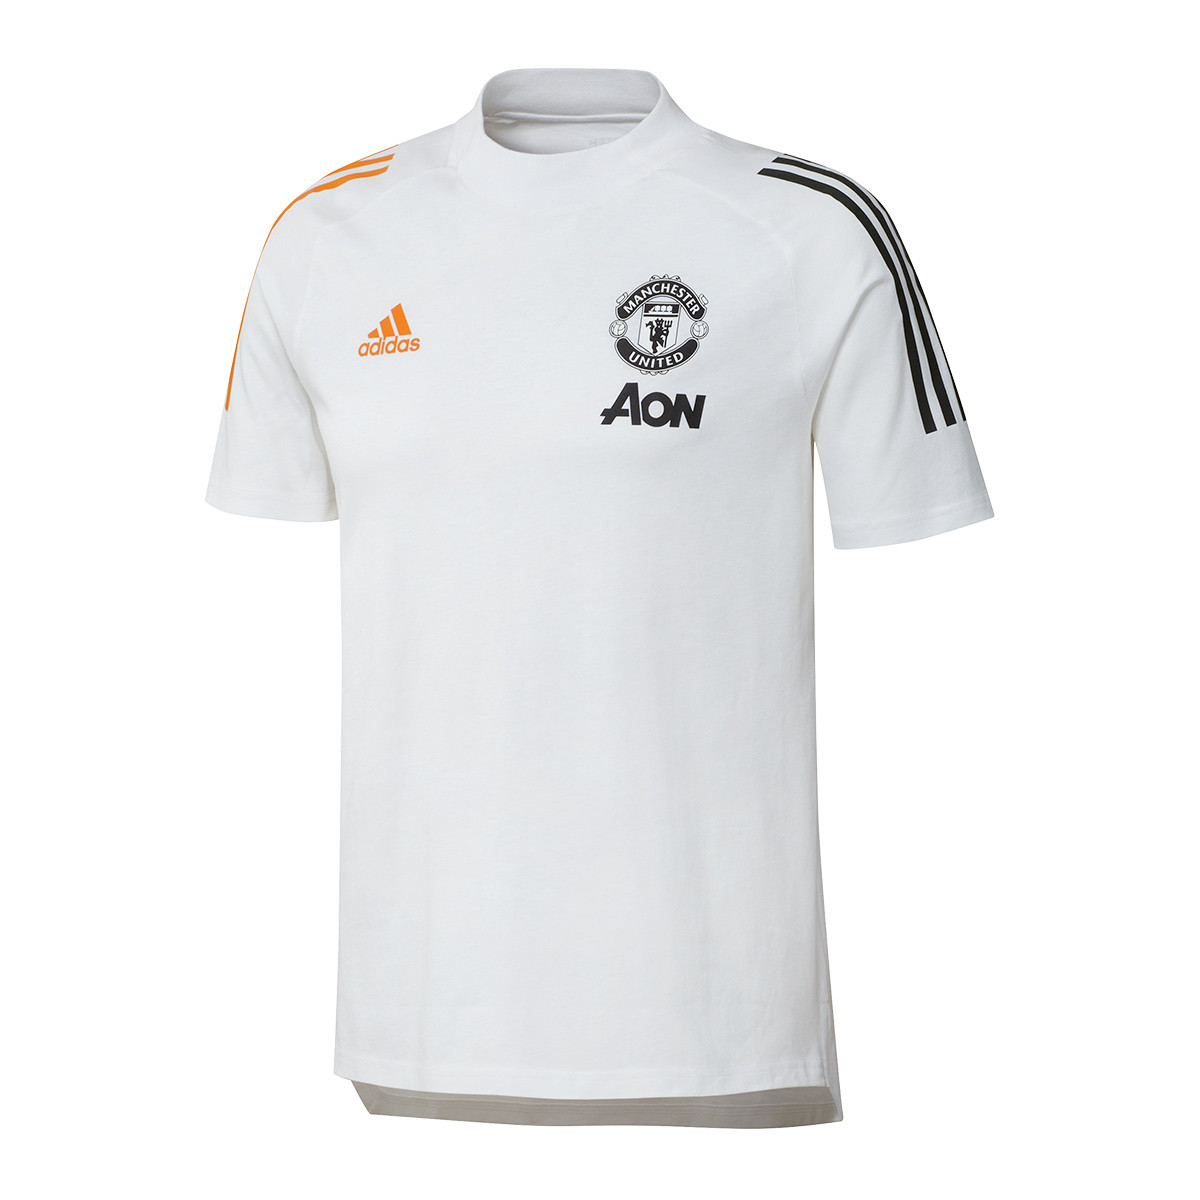 Jersey Adidas Manchester United Fc Tee 2020 2021 White Football Store Futbol Emotion